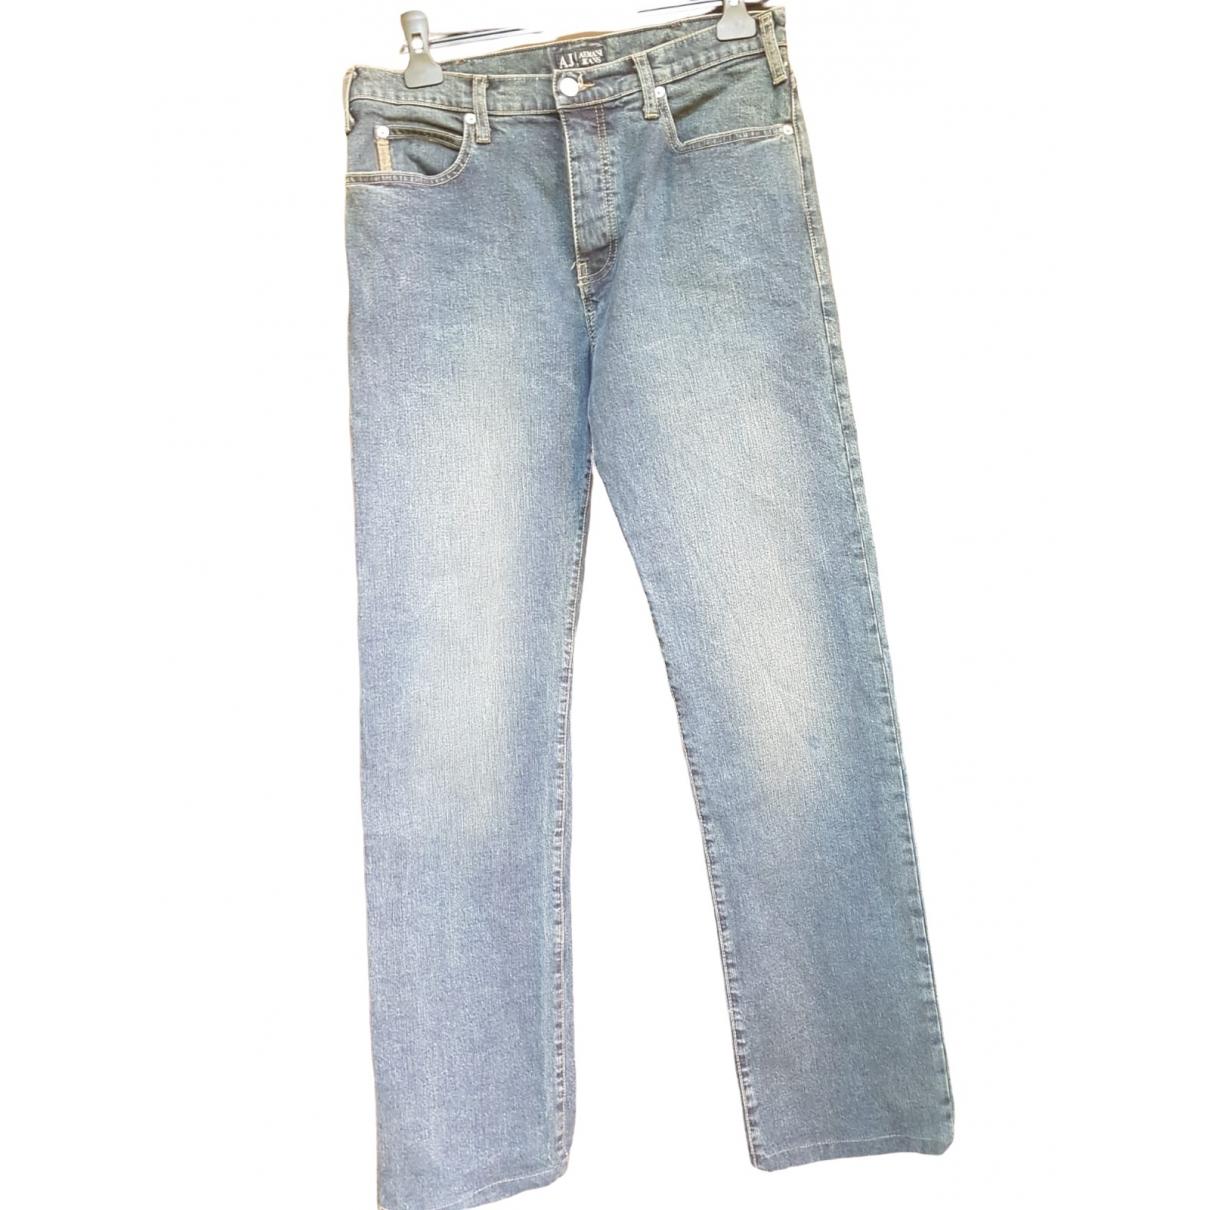 Armani Jeans \N Blue Cotton - elasthane Jeans for Men 34 US